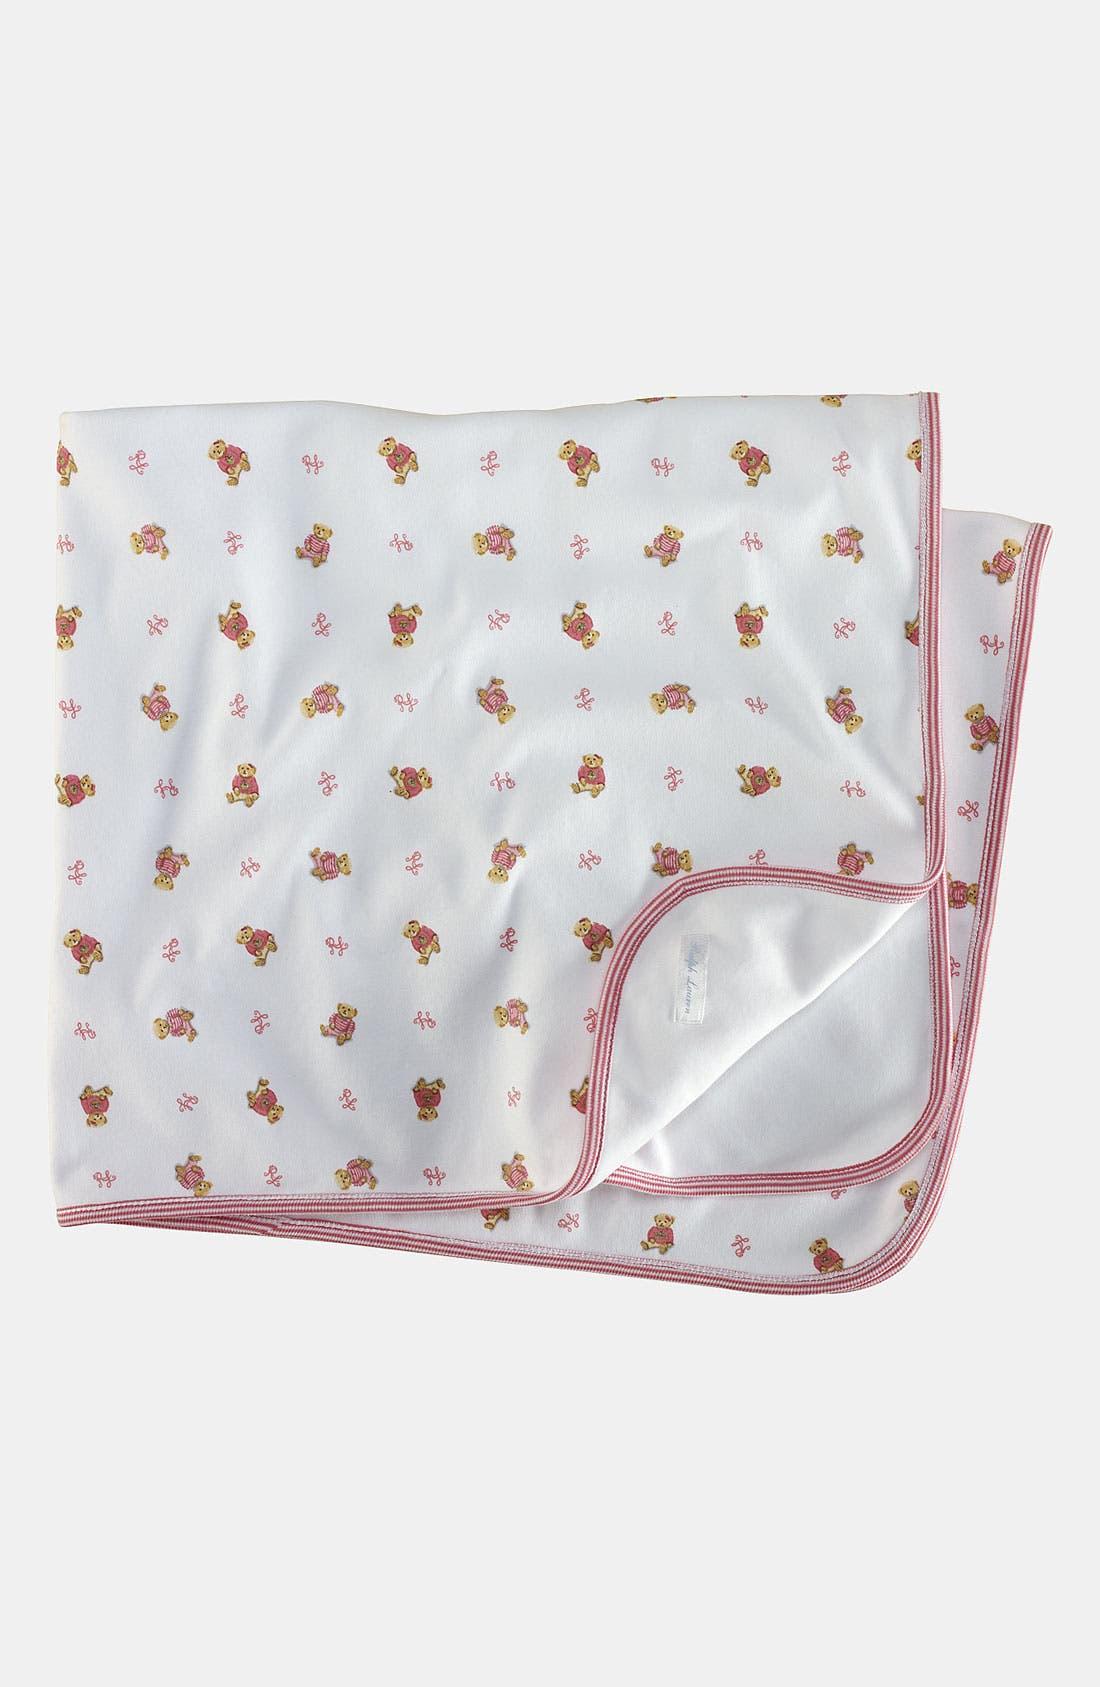 Alternate Image 1 Selected - Ralph Lauren Reversible Receiving Blanket